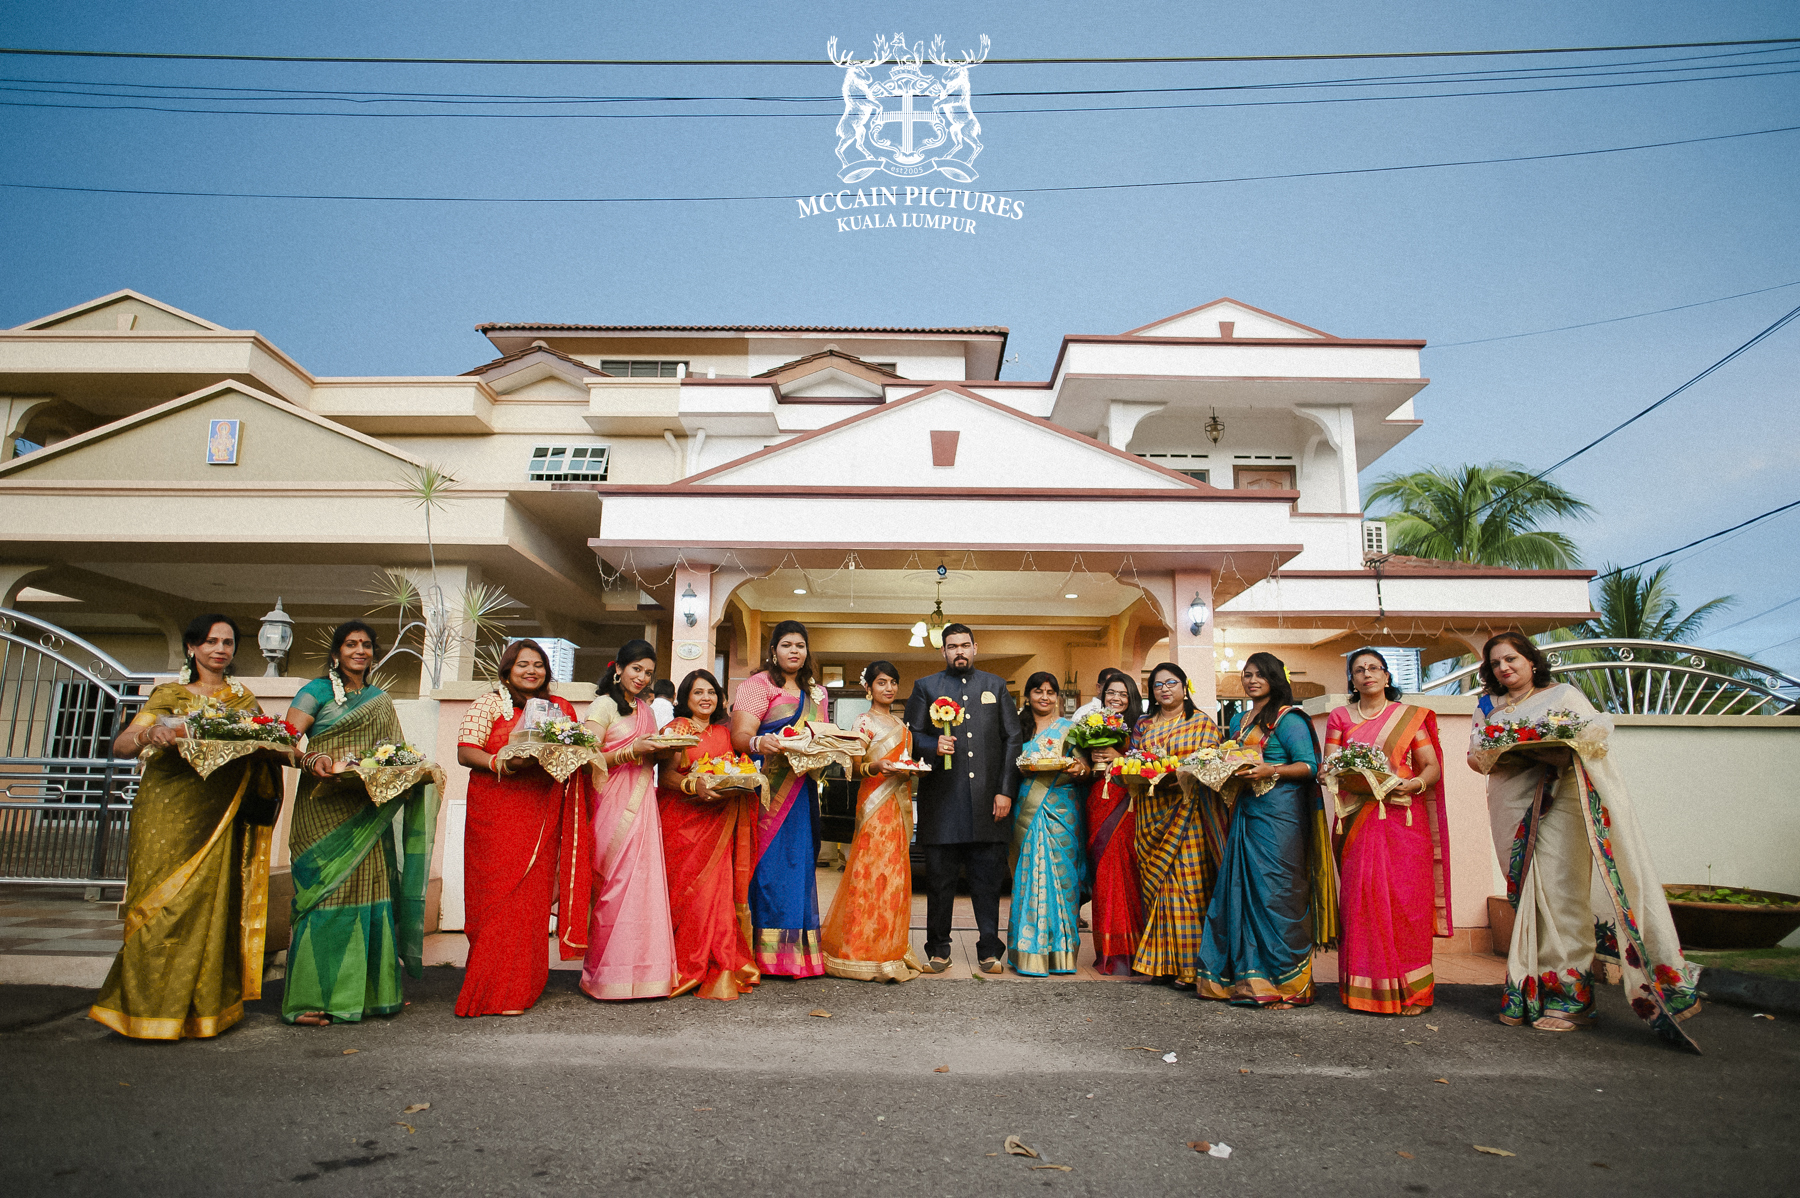 mccain goh mccain pictures wedding photographer malaysia-355